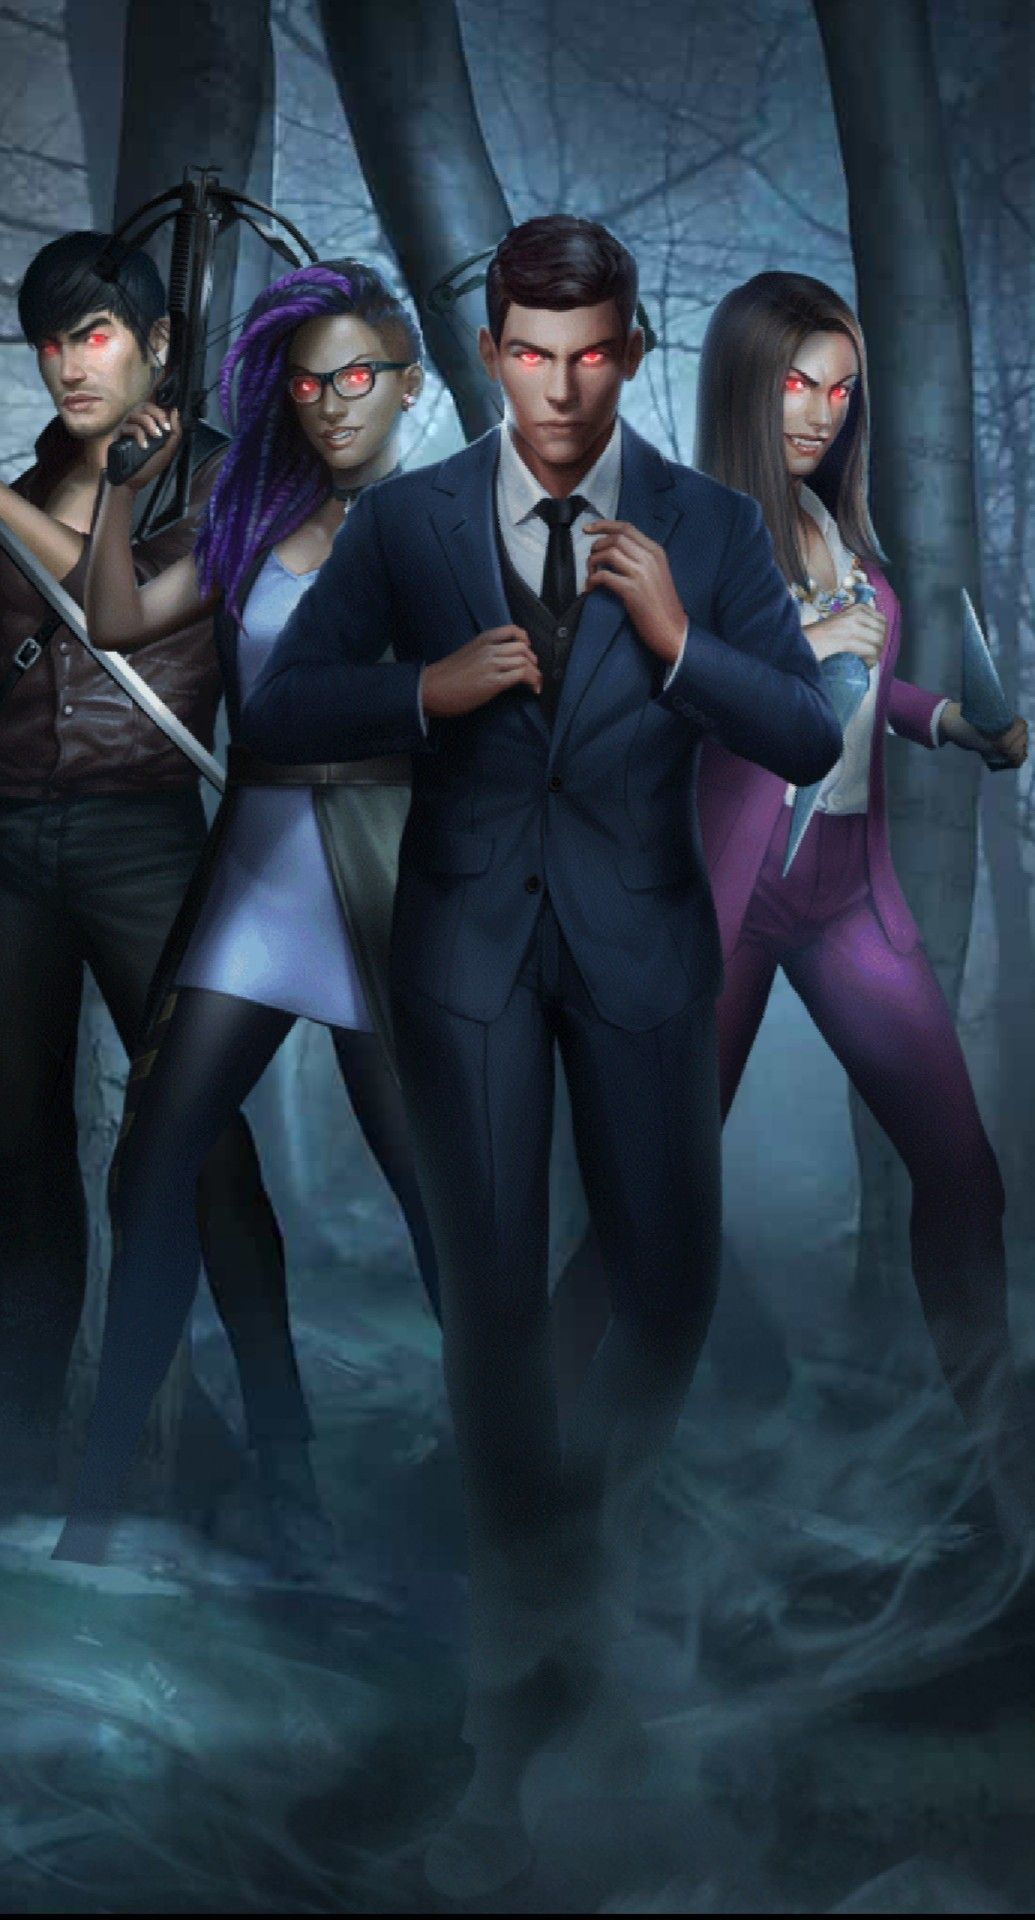 Bloodbound: Jax Matsuo, Lily Spencer, Adrian Raines, Kamilah